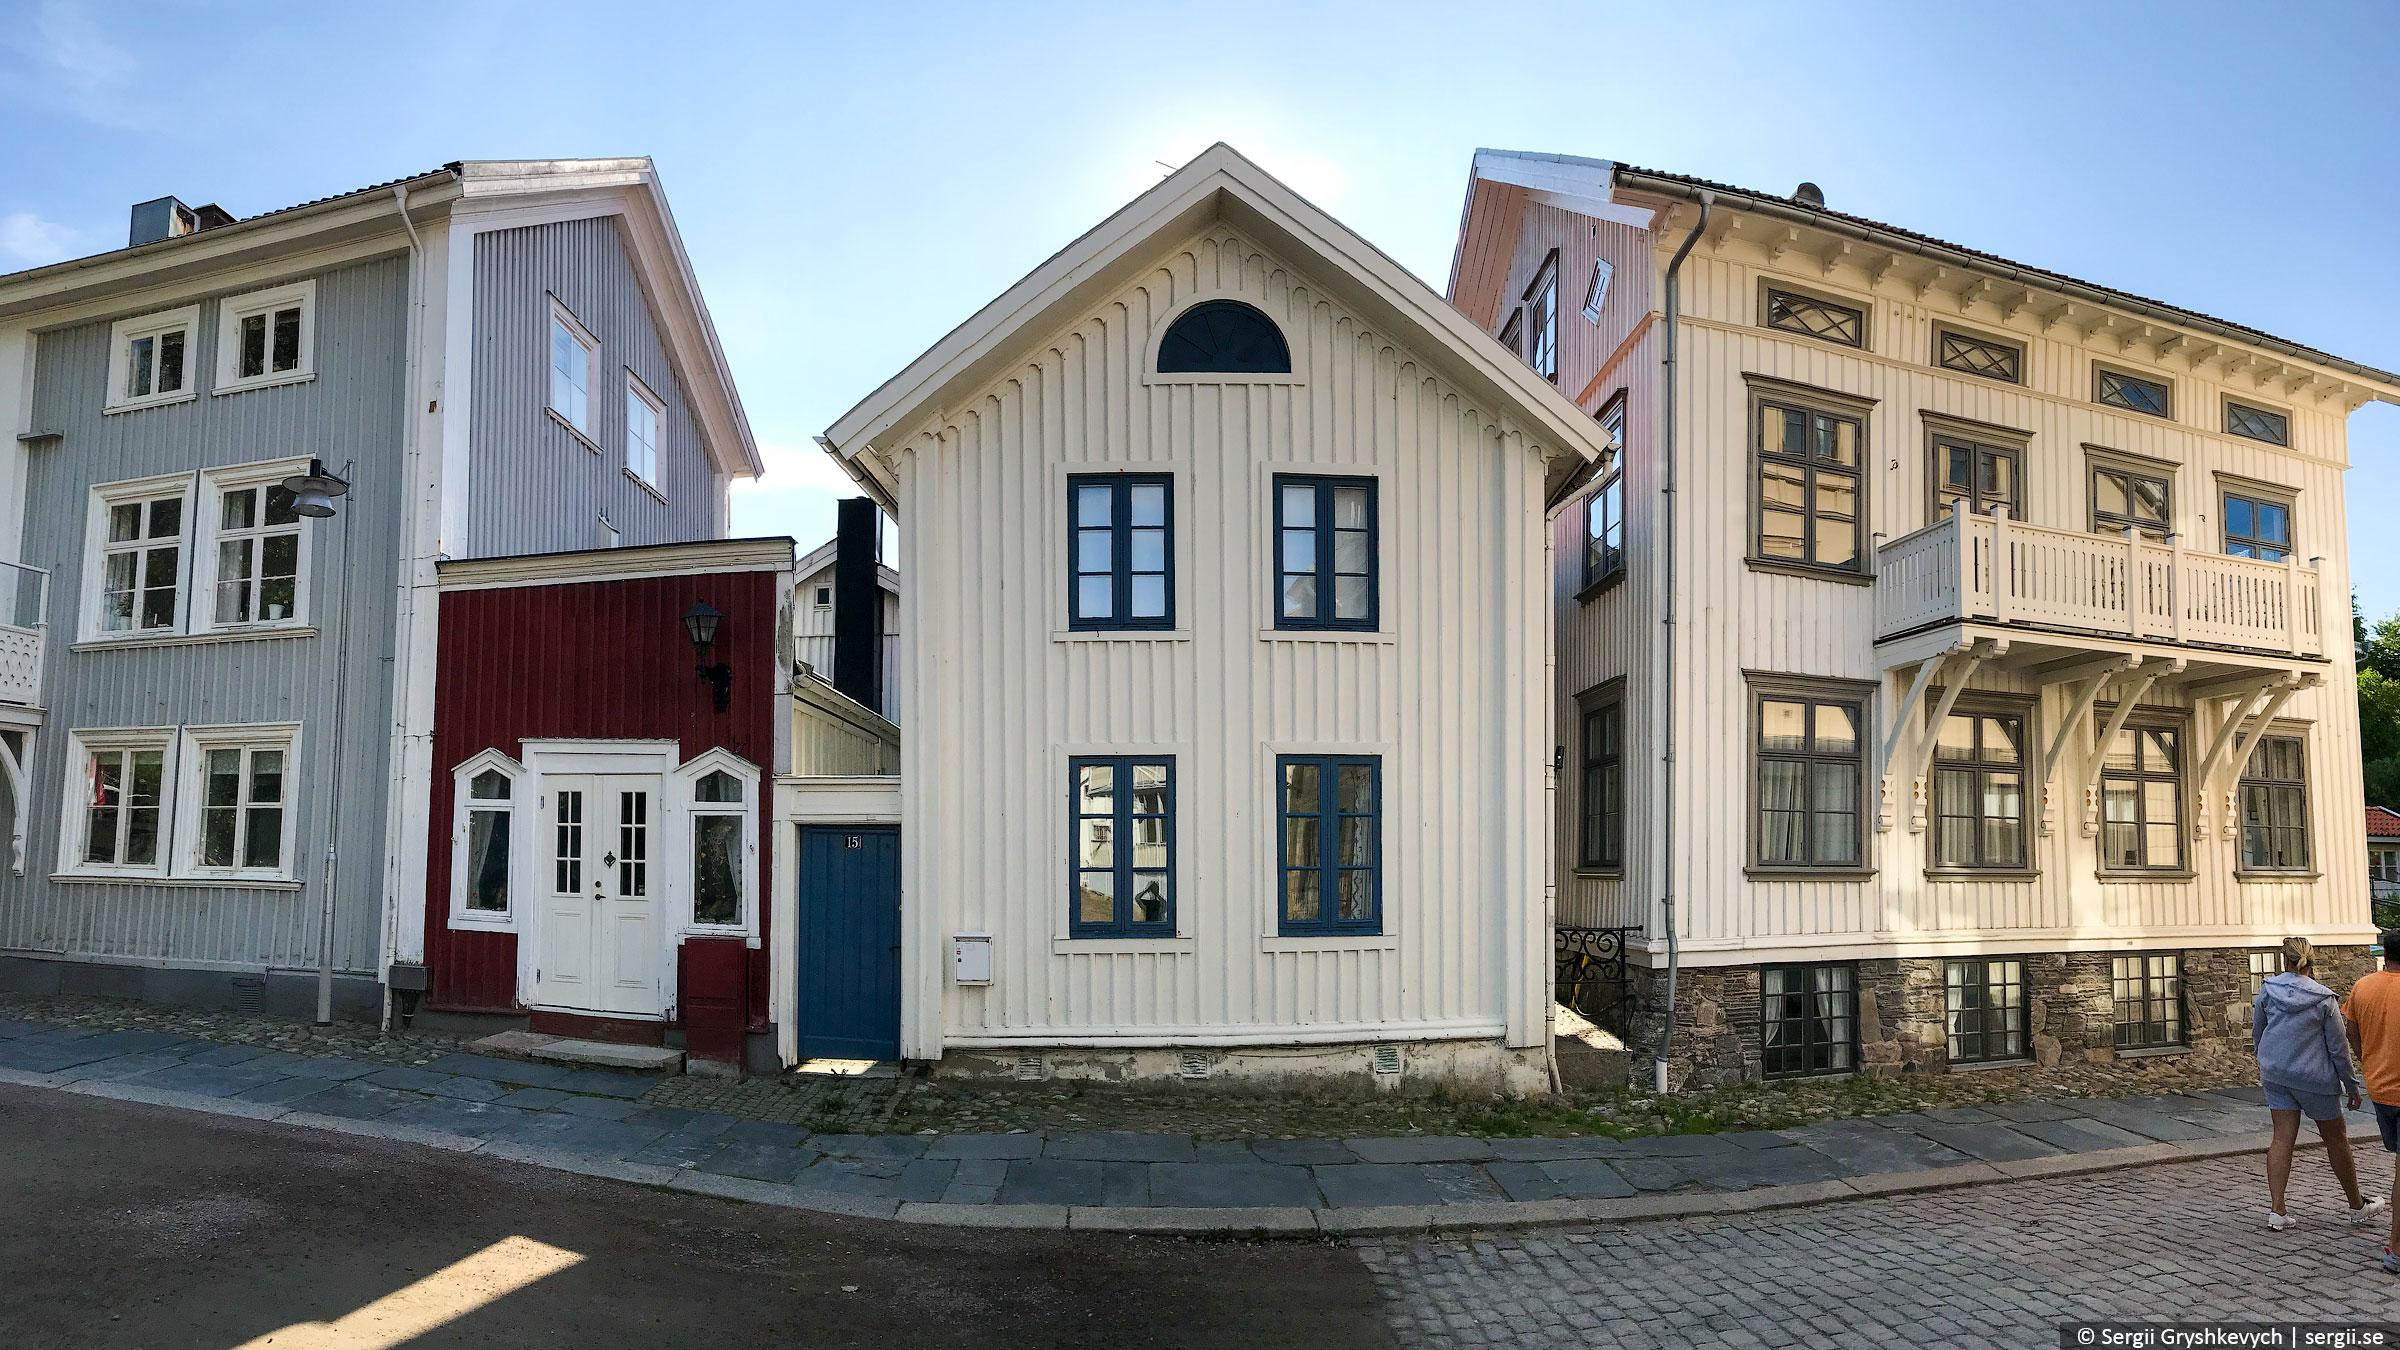 west-coast-sweden-2018-11